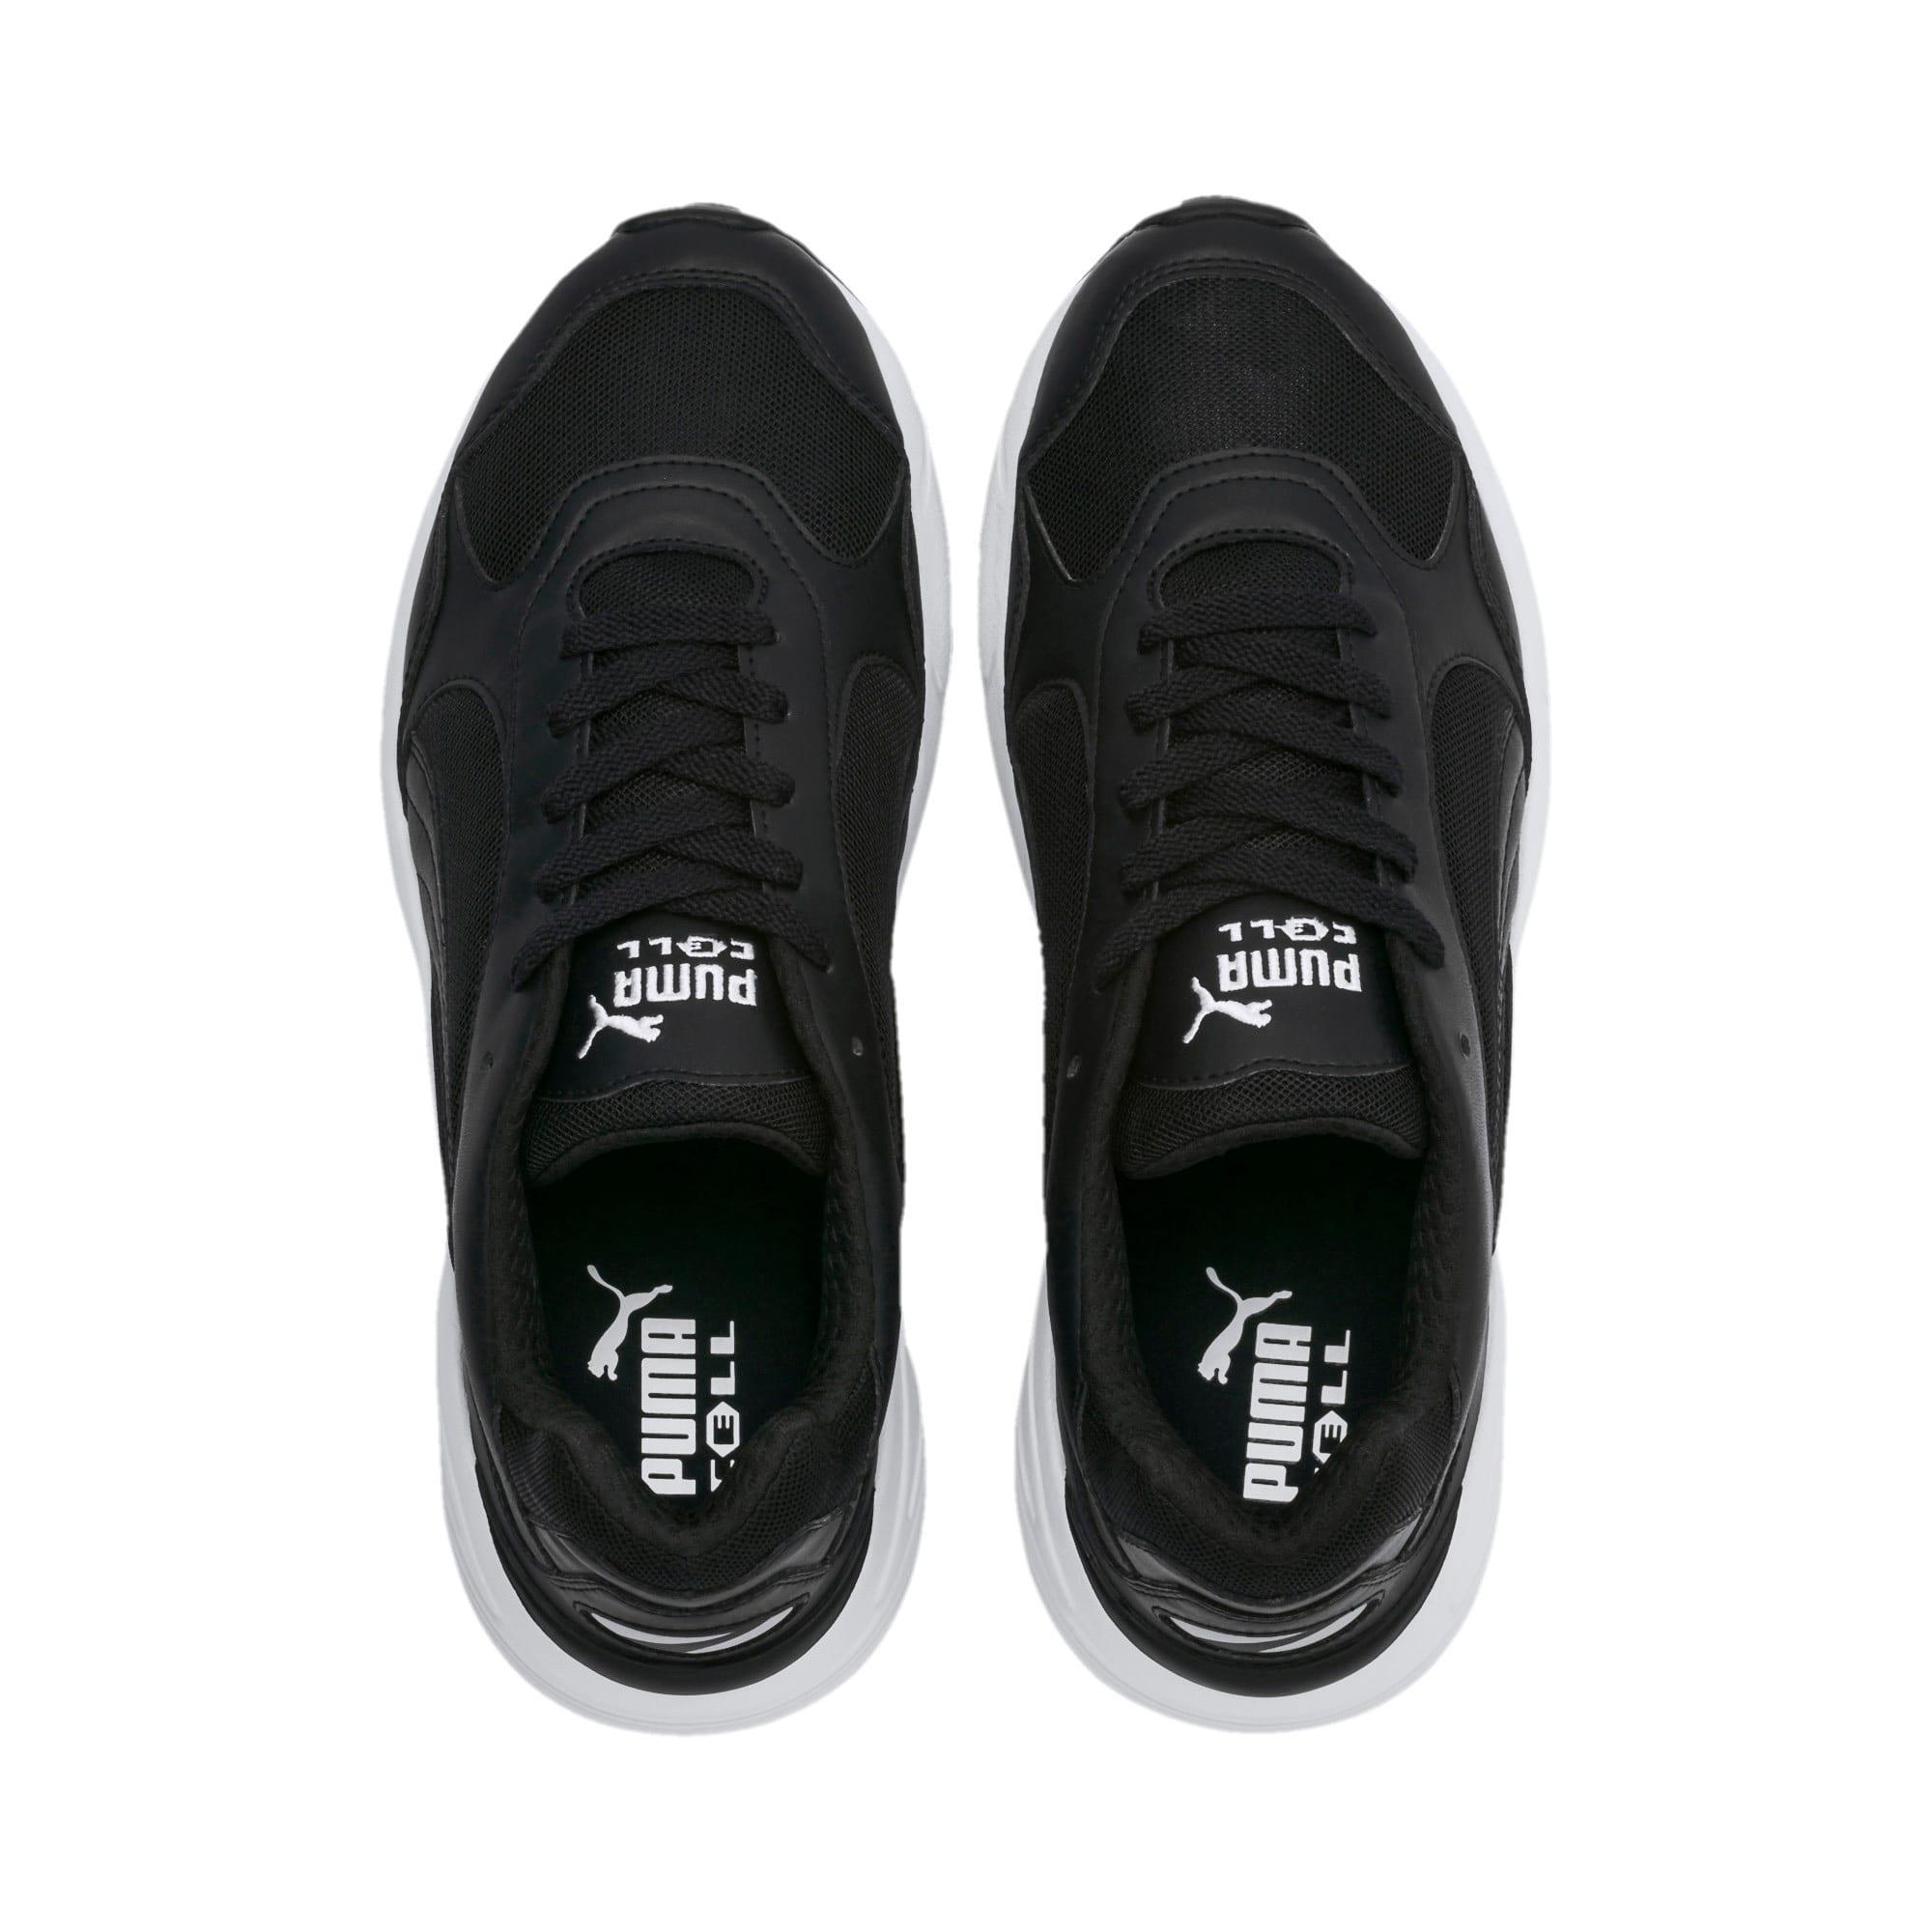 Thumbnail 6 of CELL Viper Sneakers, Puma Black-Puma White, medium